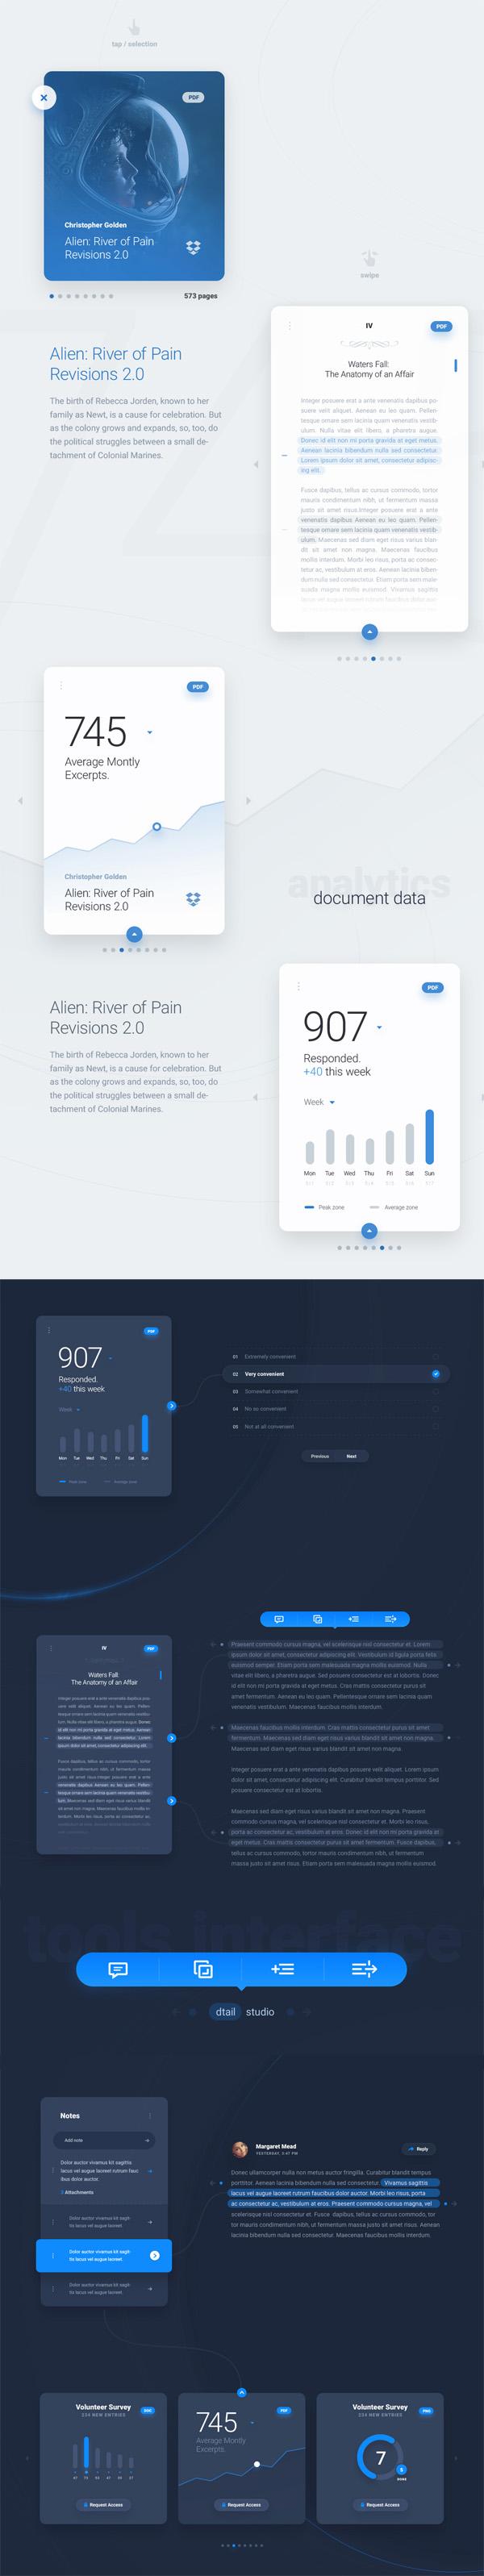 LiquidPro UI Kit - Free Download